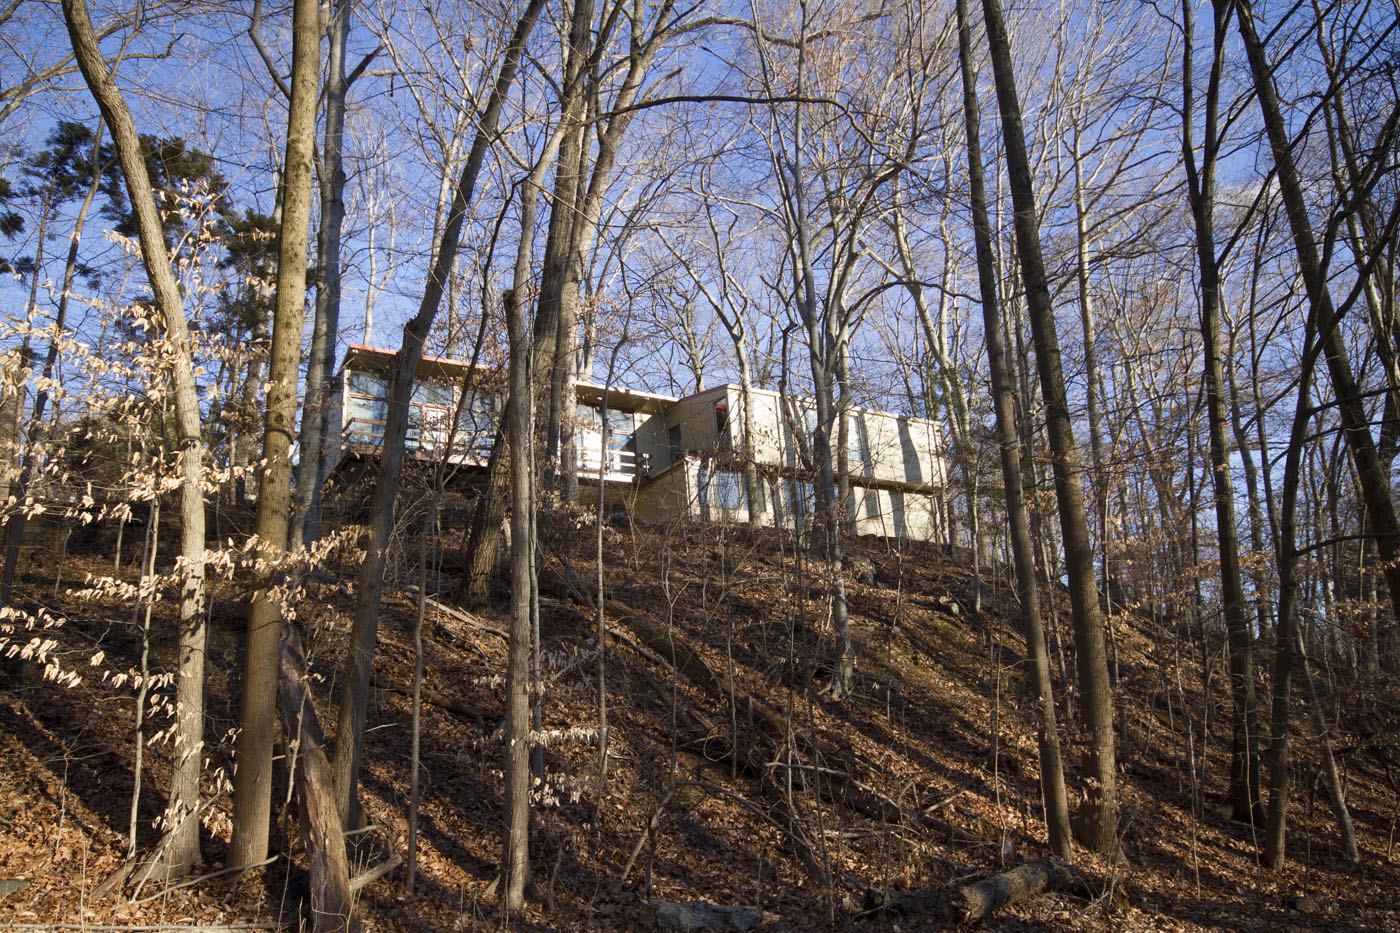 Mount Washington: Exploring Baltimore's neighborhoods